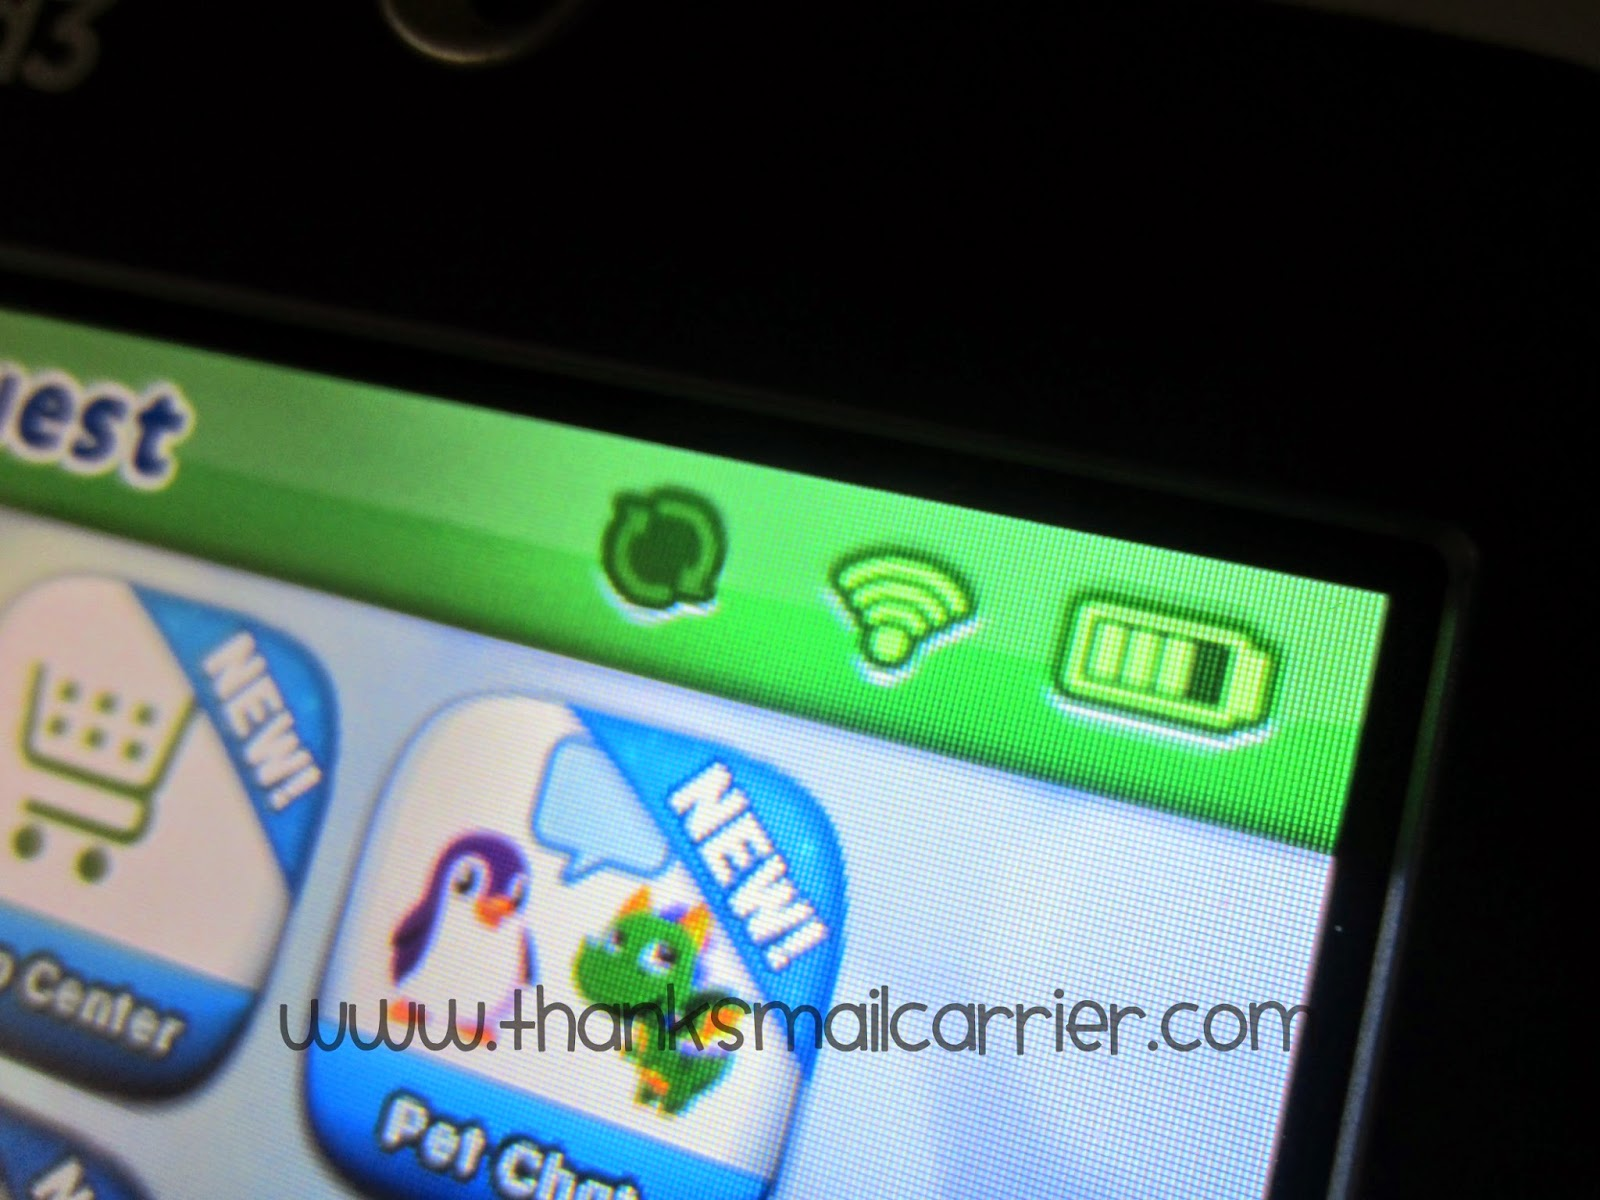 LeapPad3 wi-fi